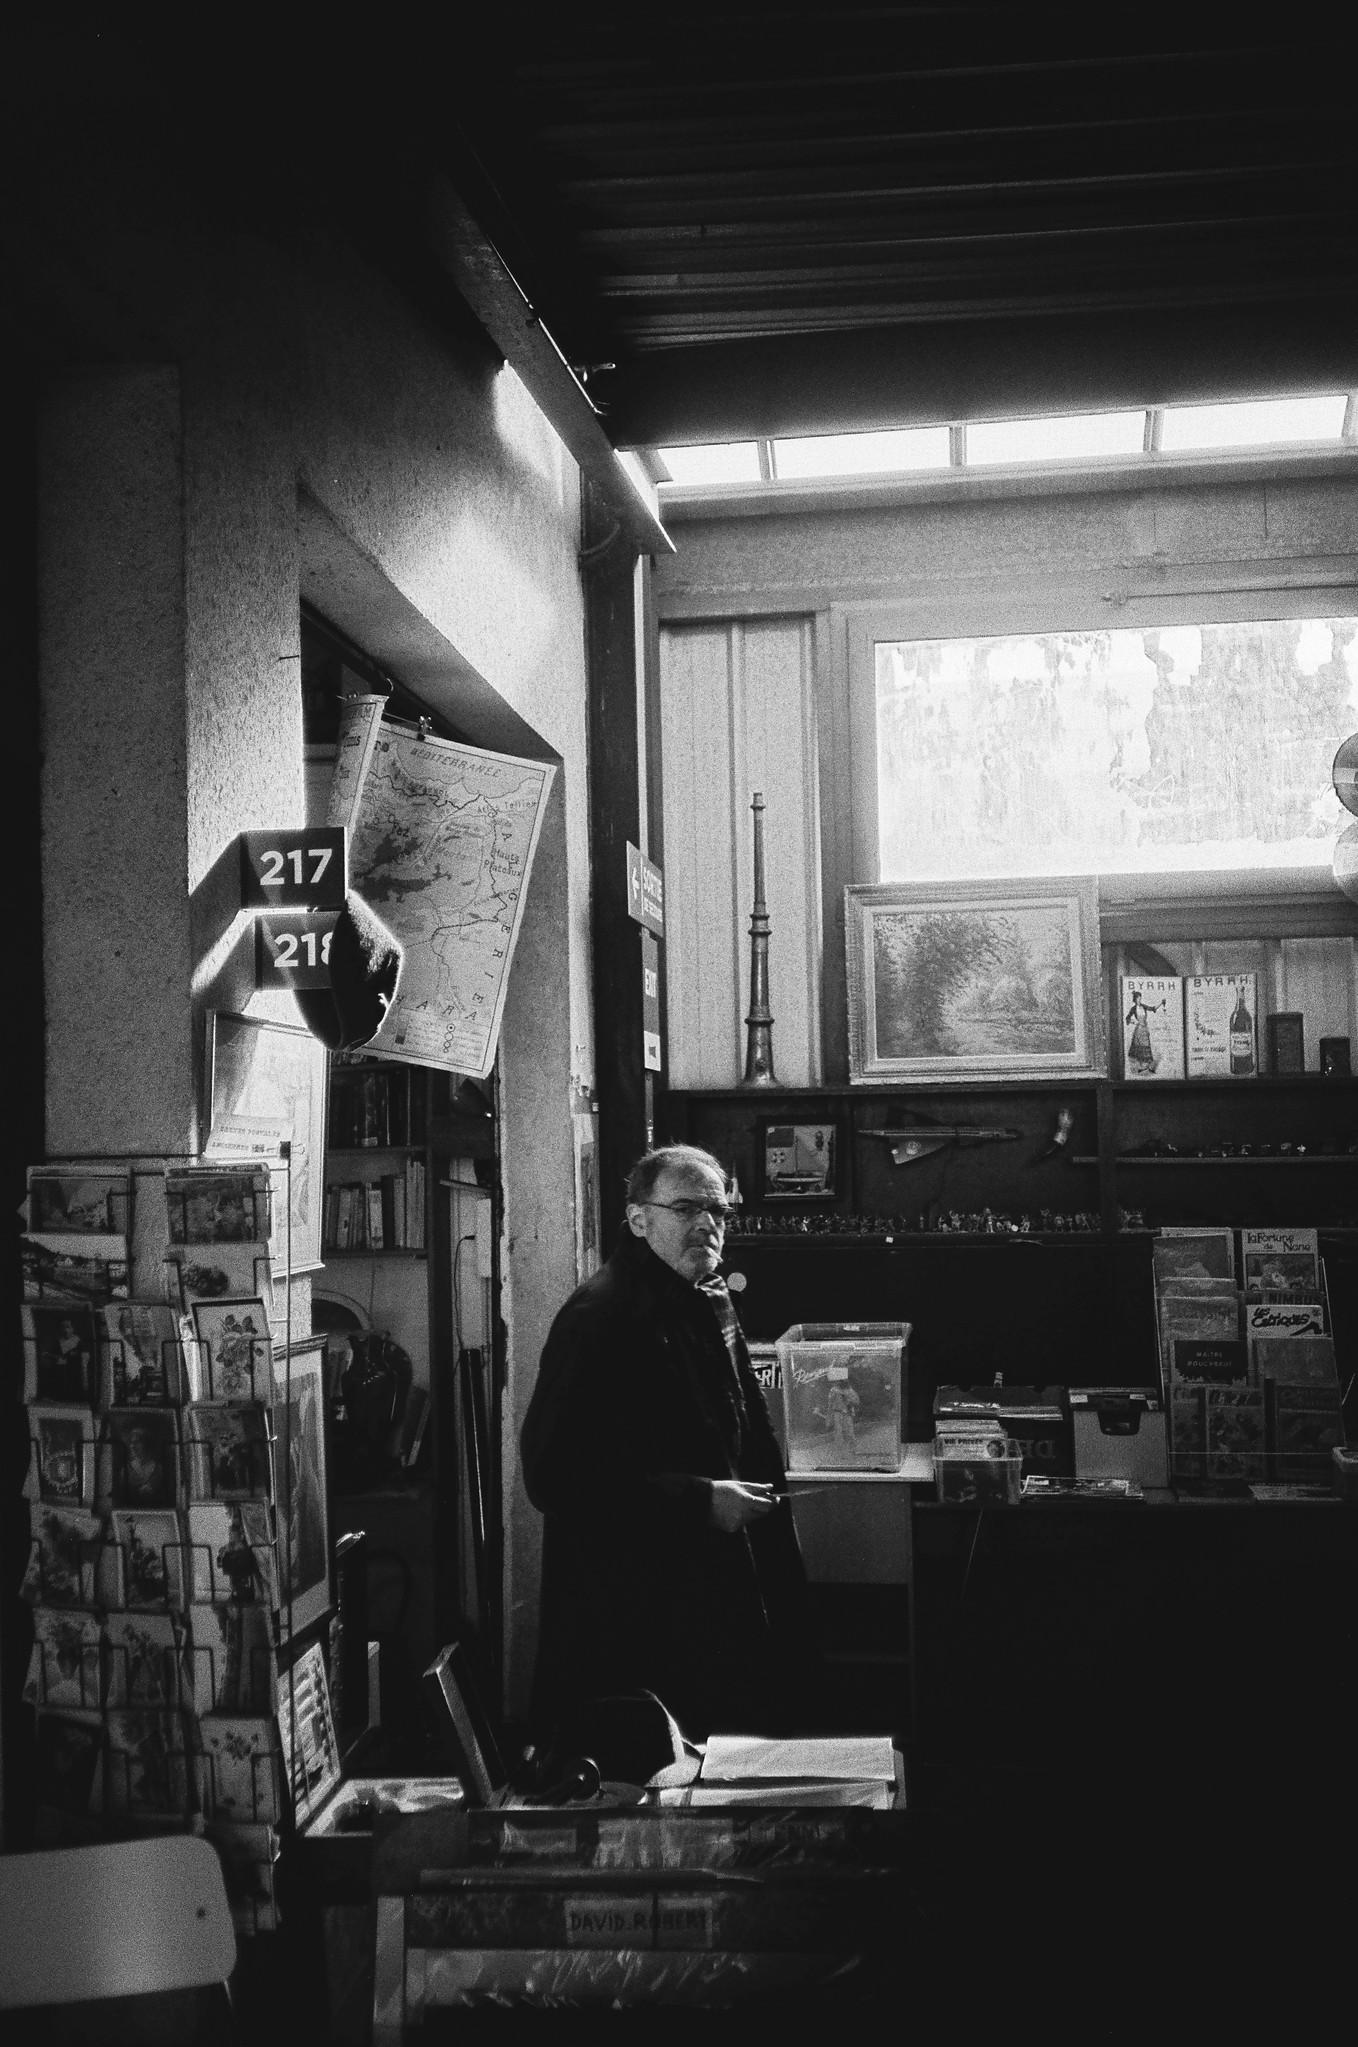 Man Smoking in Flea Market